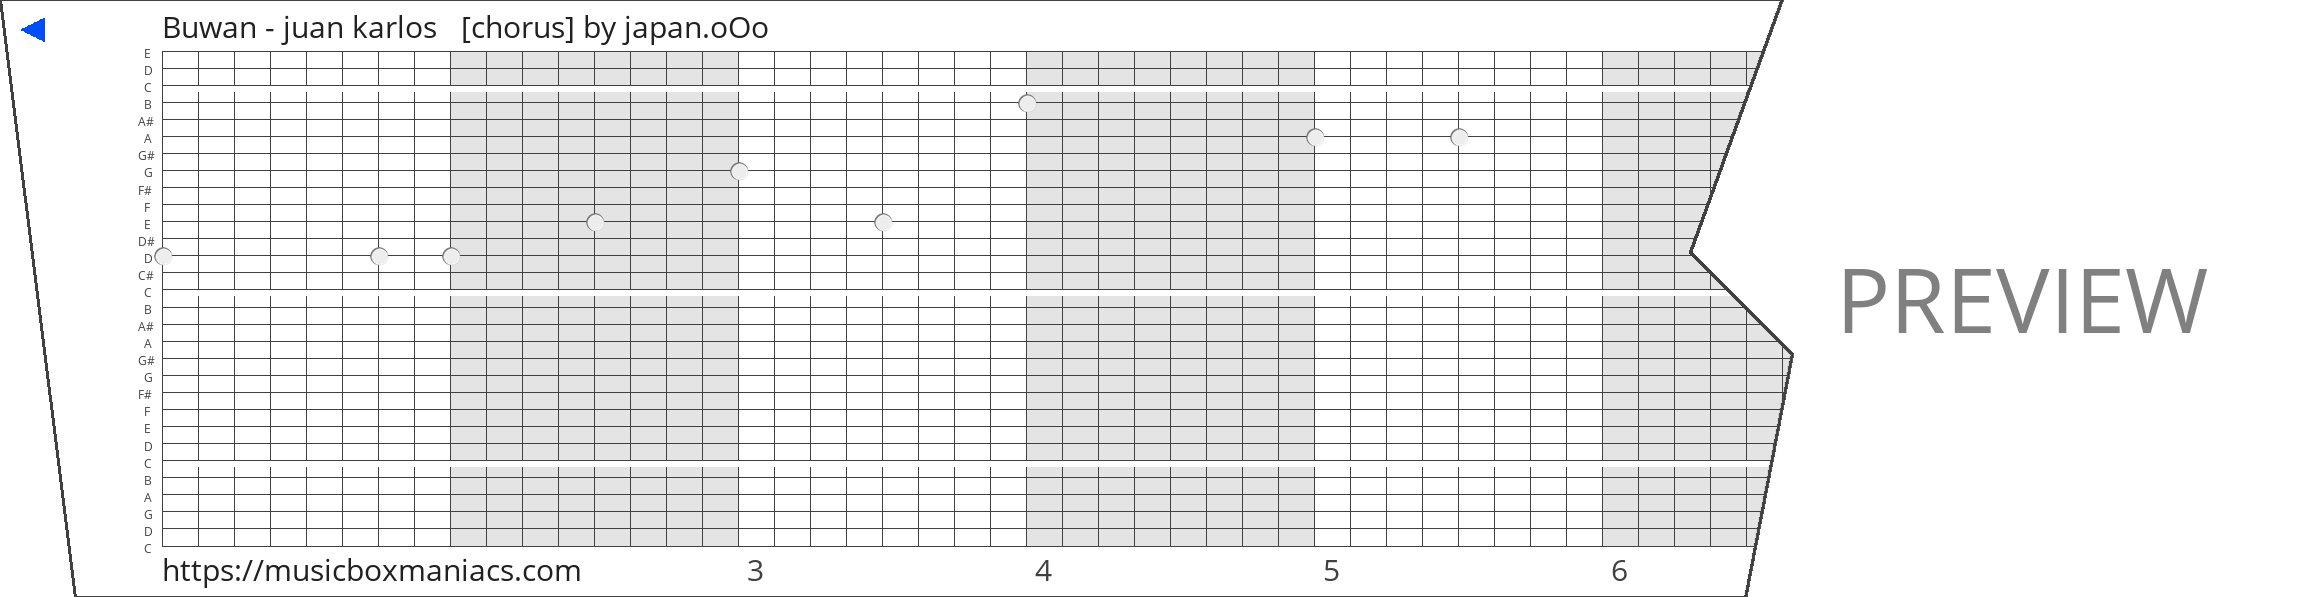 Buwan - juan karlos   [chorus] 30 note music box paper strip